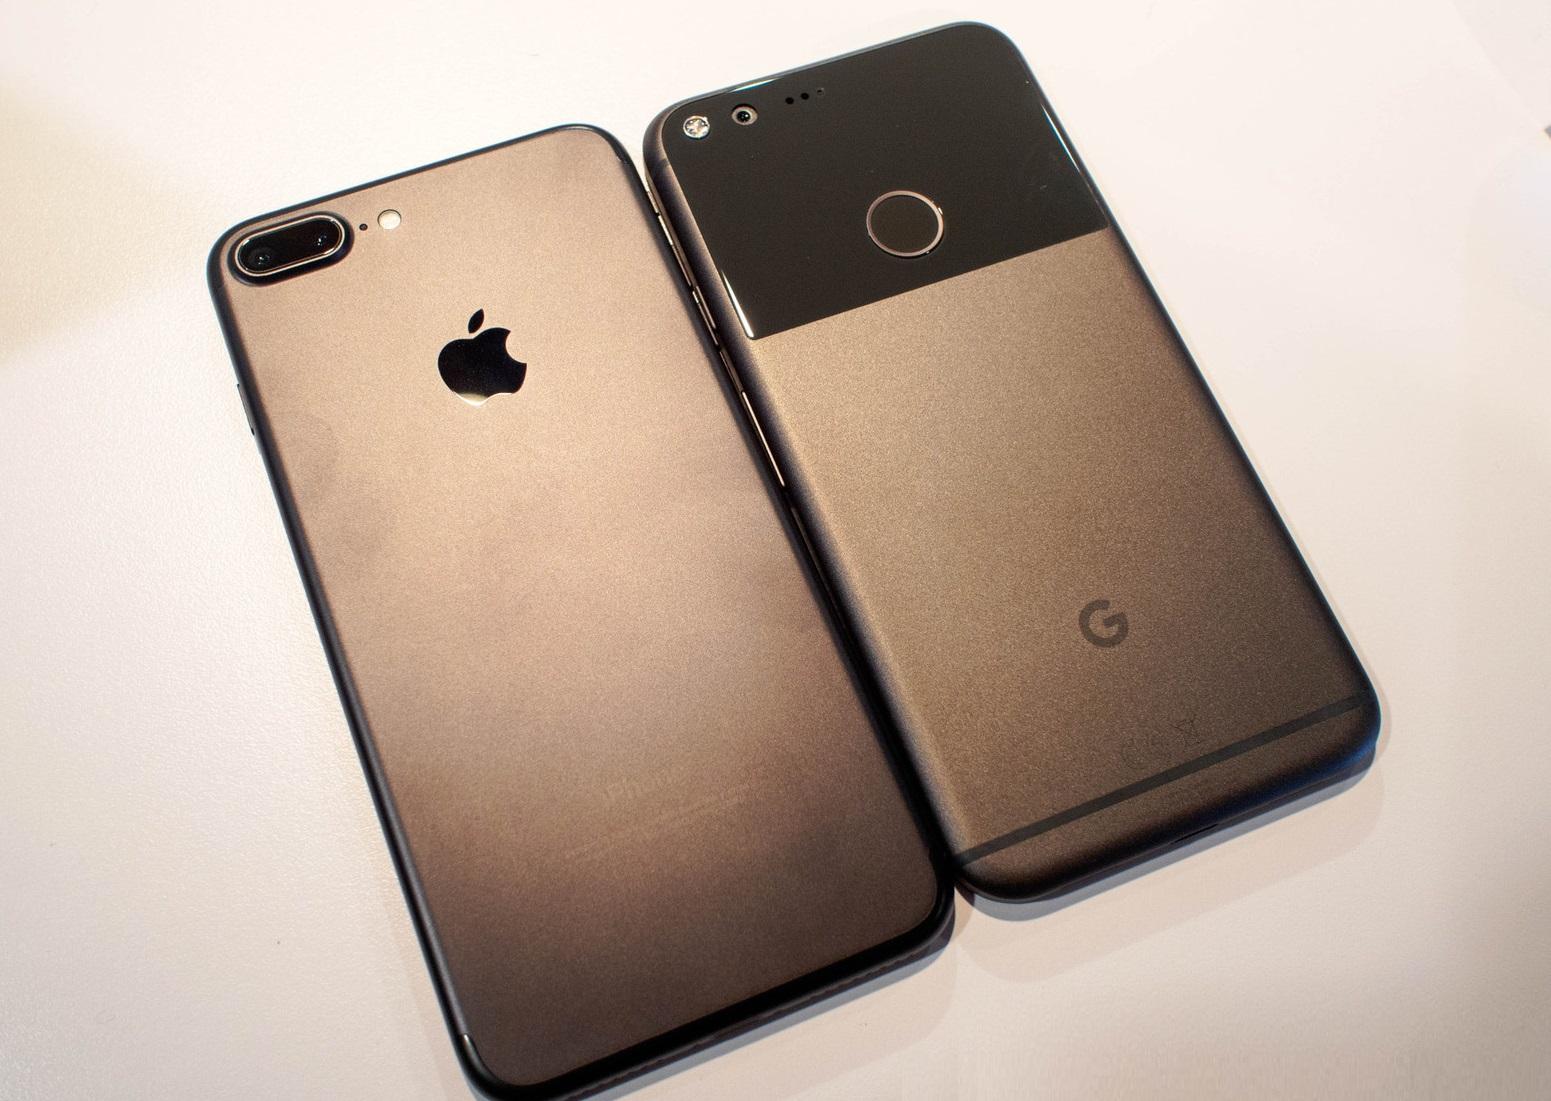 sravnenie-iphone-7-plus-i-google-pixel-xl-dizajjn